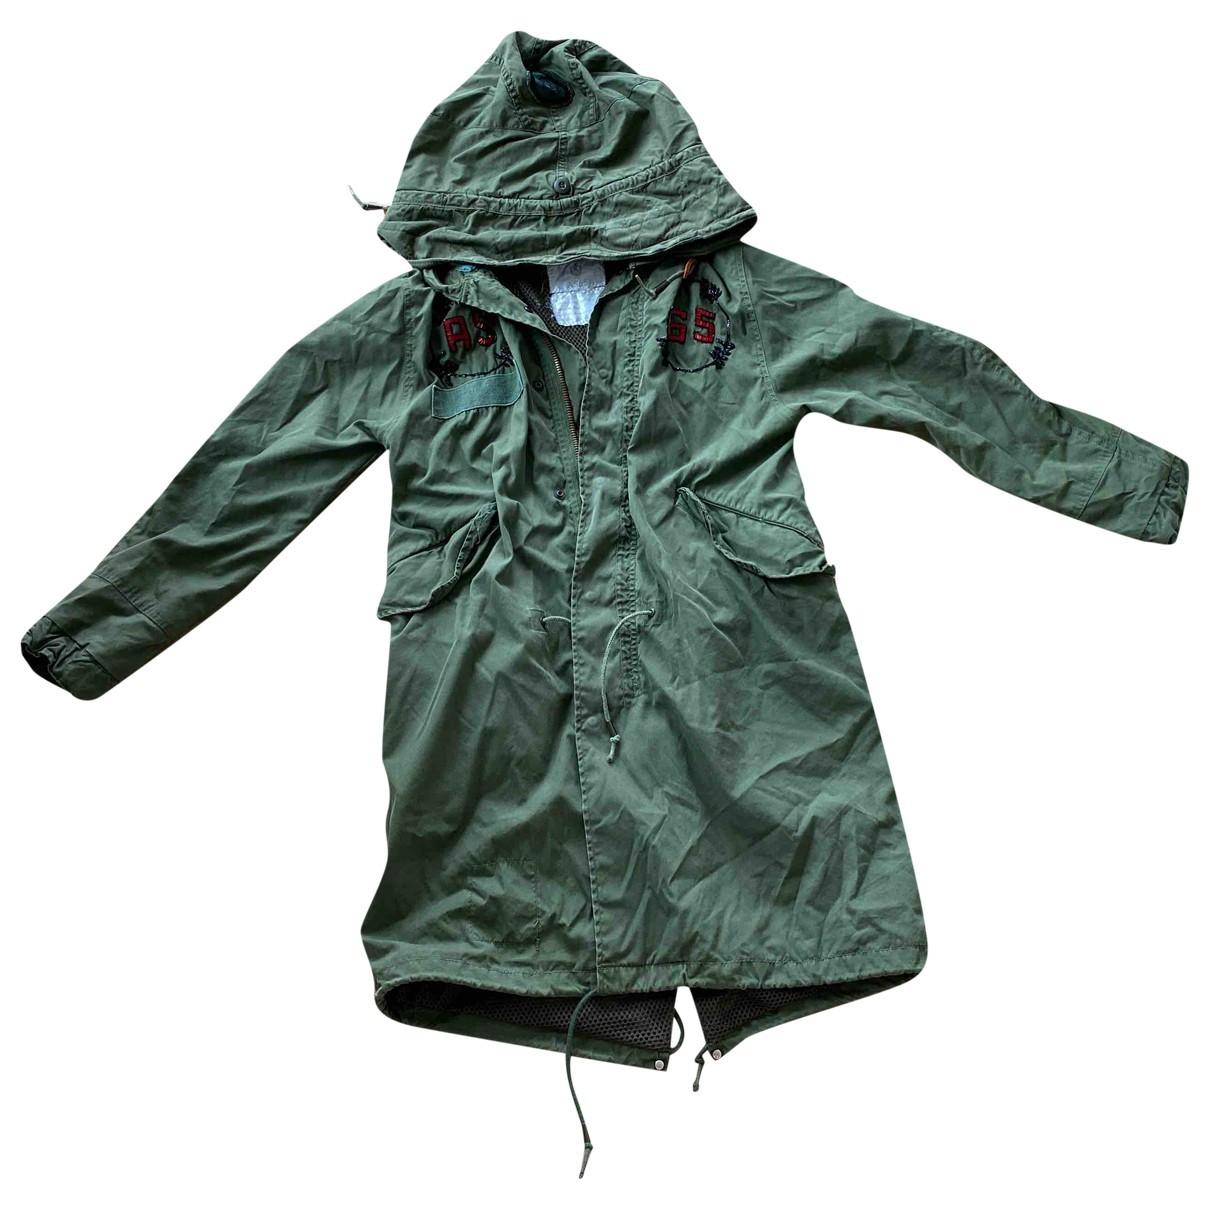 As65 \N Khaki Cotton jacket for Women M International